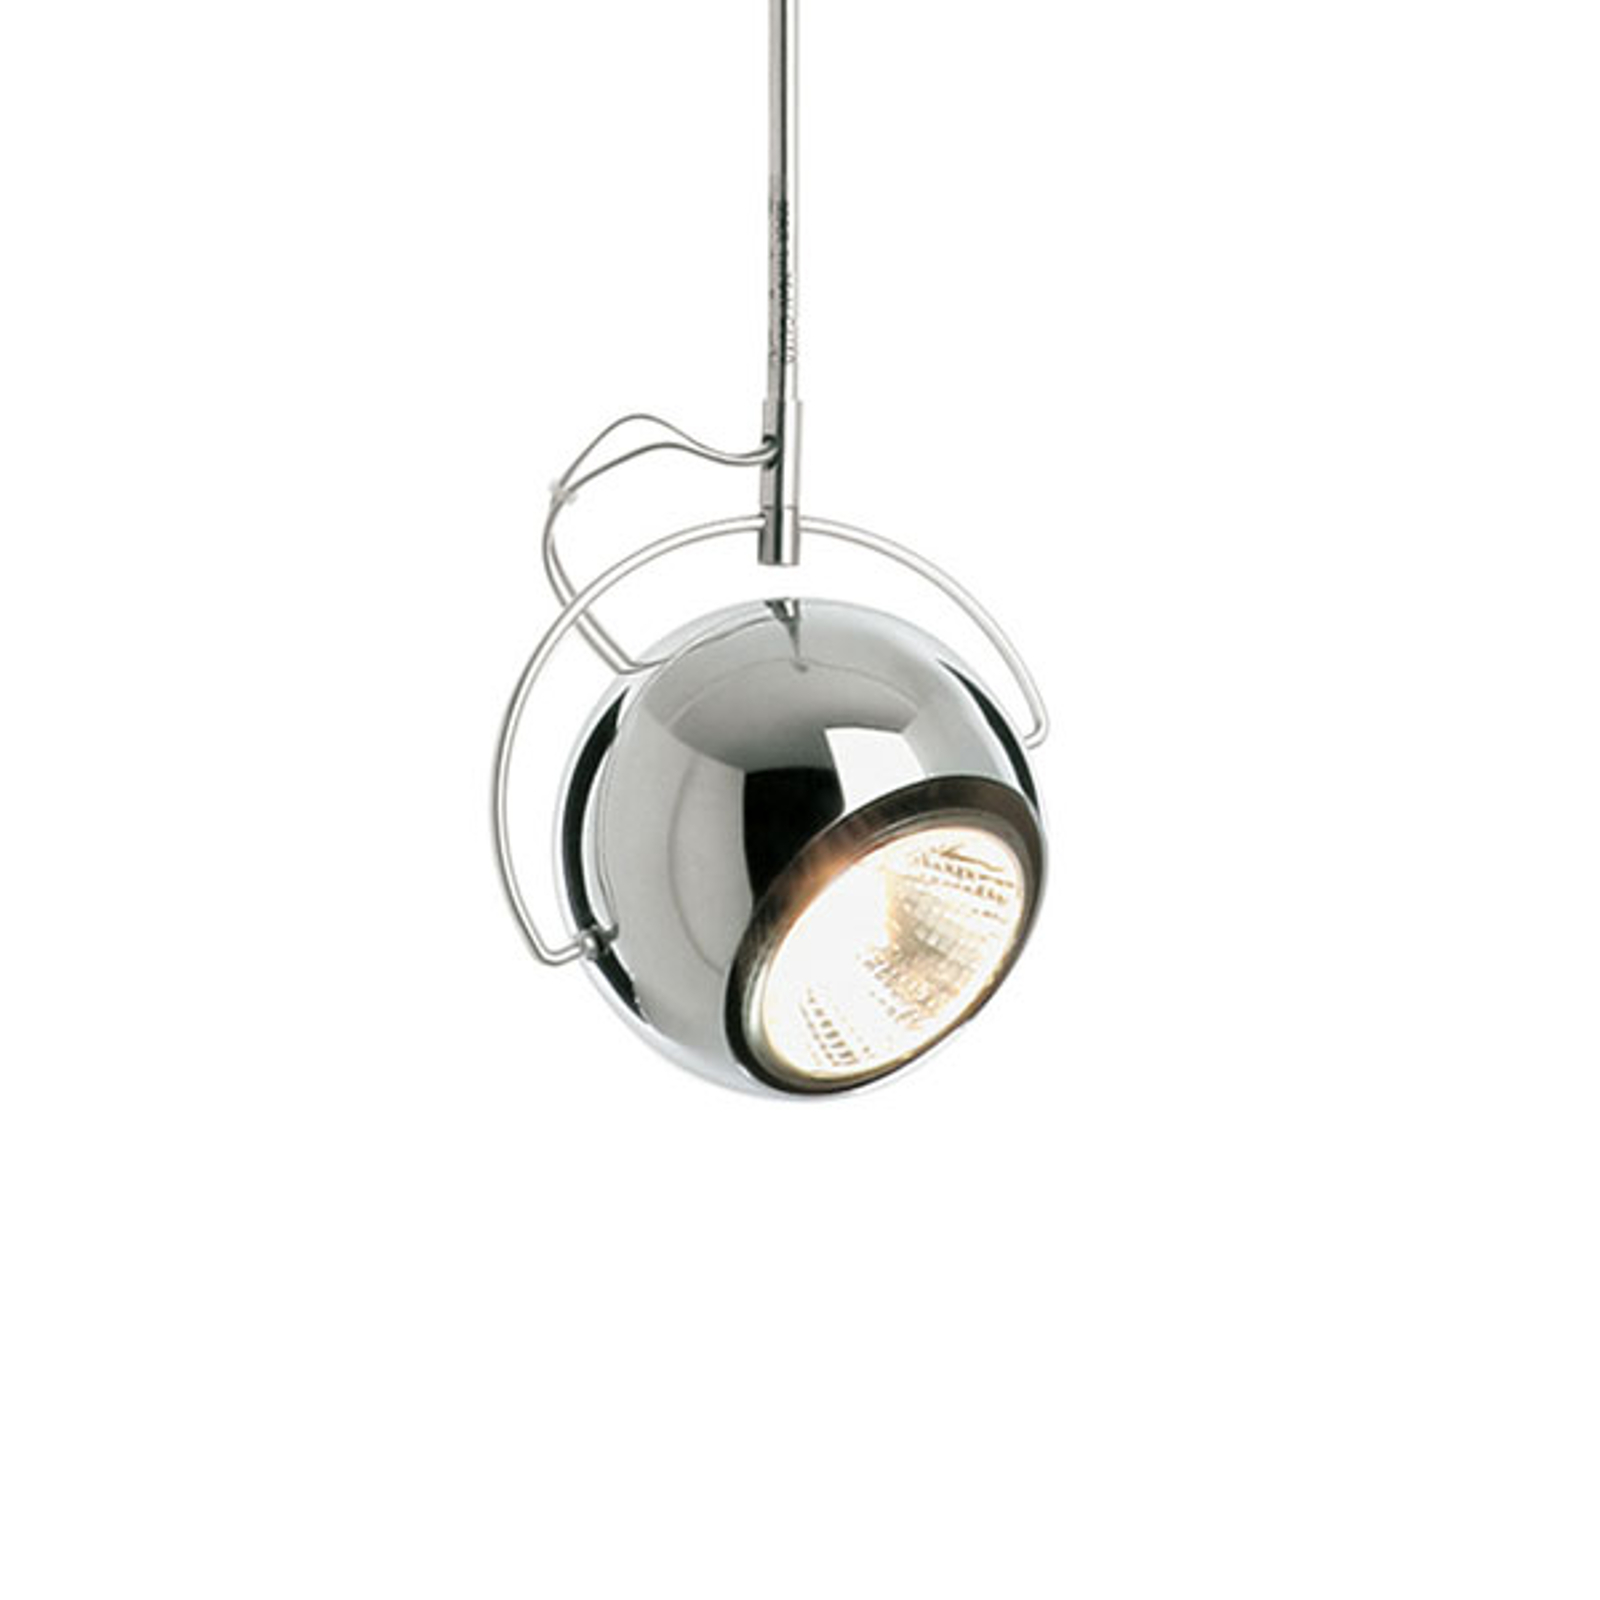 Fabbian Beluga Steel Chrom-Hängeleuchte, Ø 9 cm